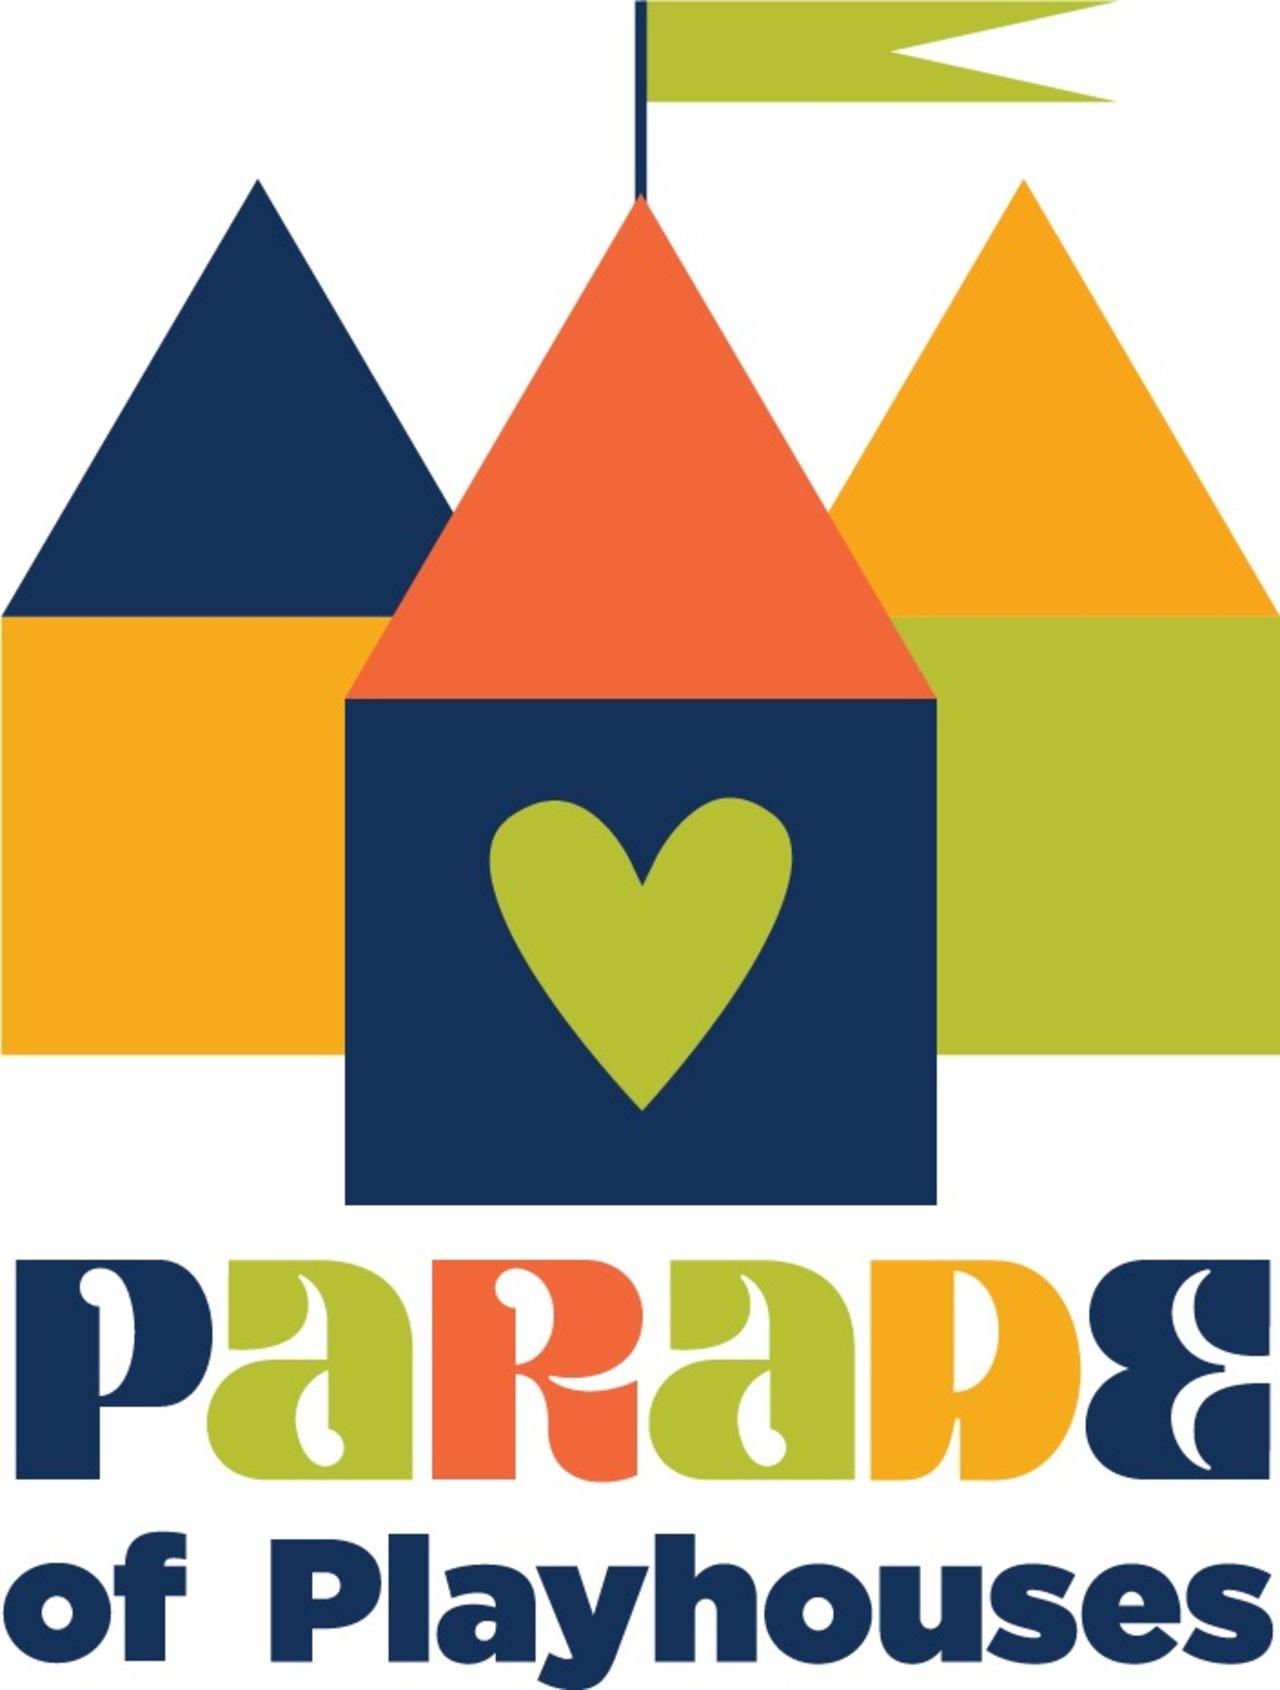 Parade of Playhouses 2021